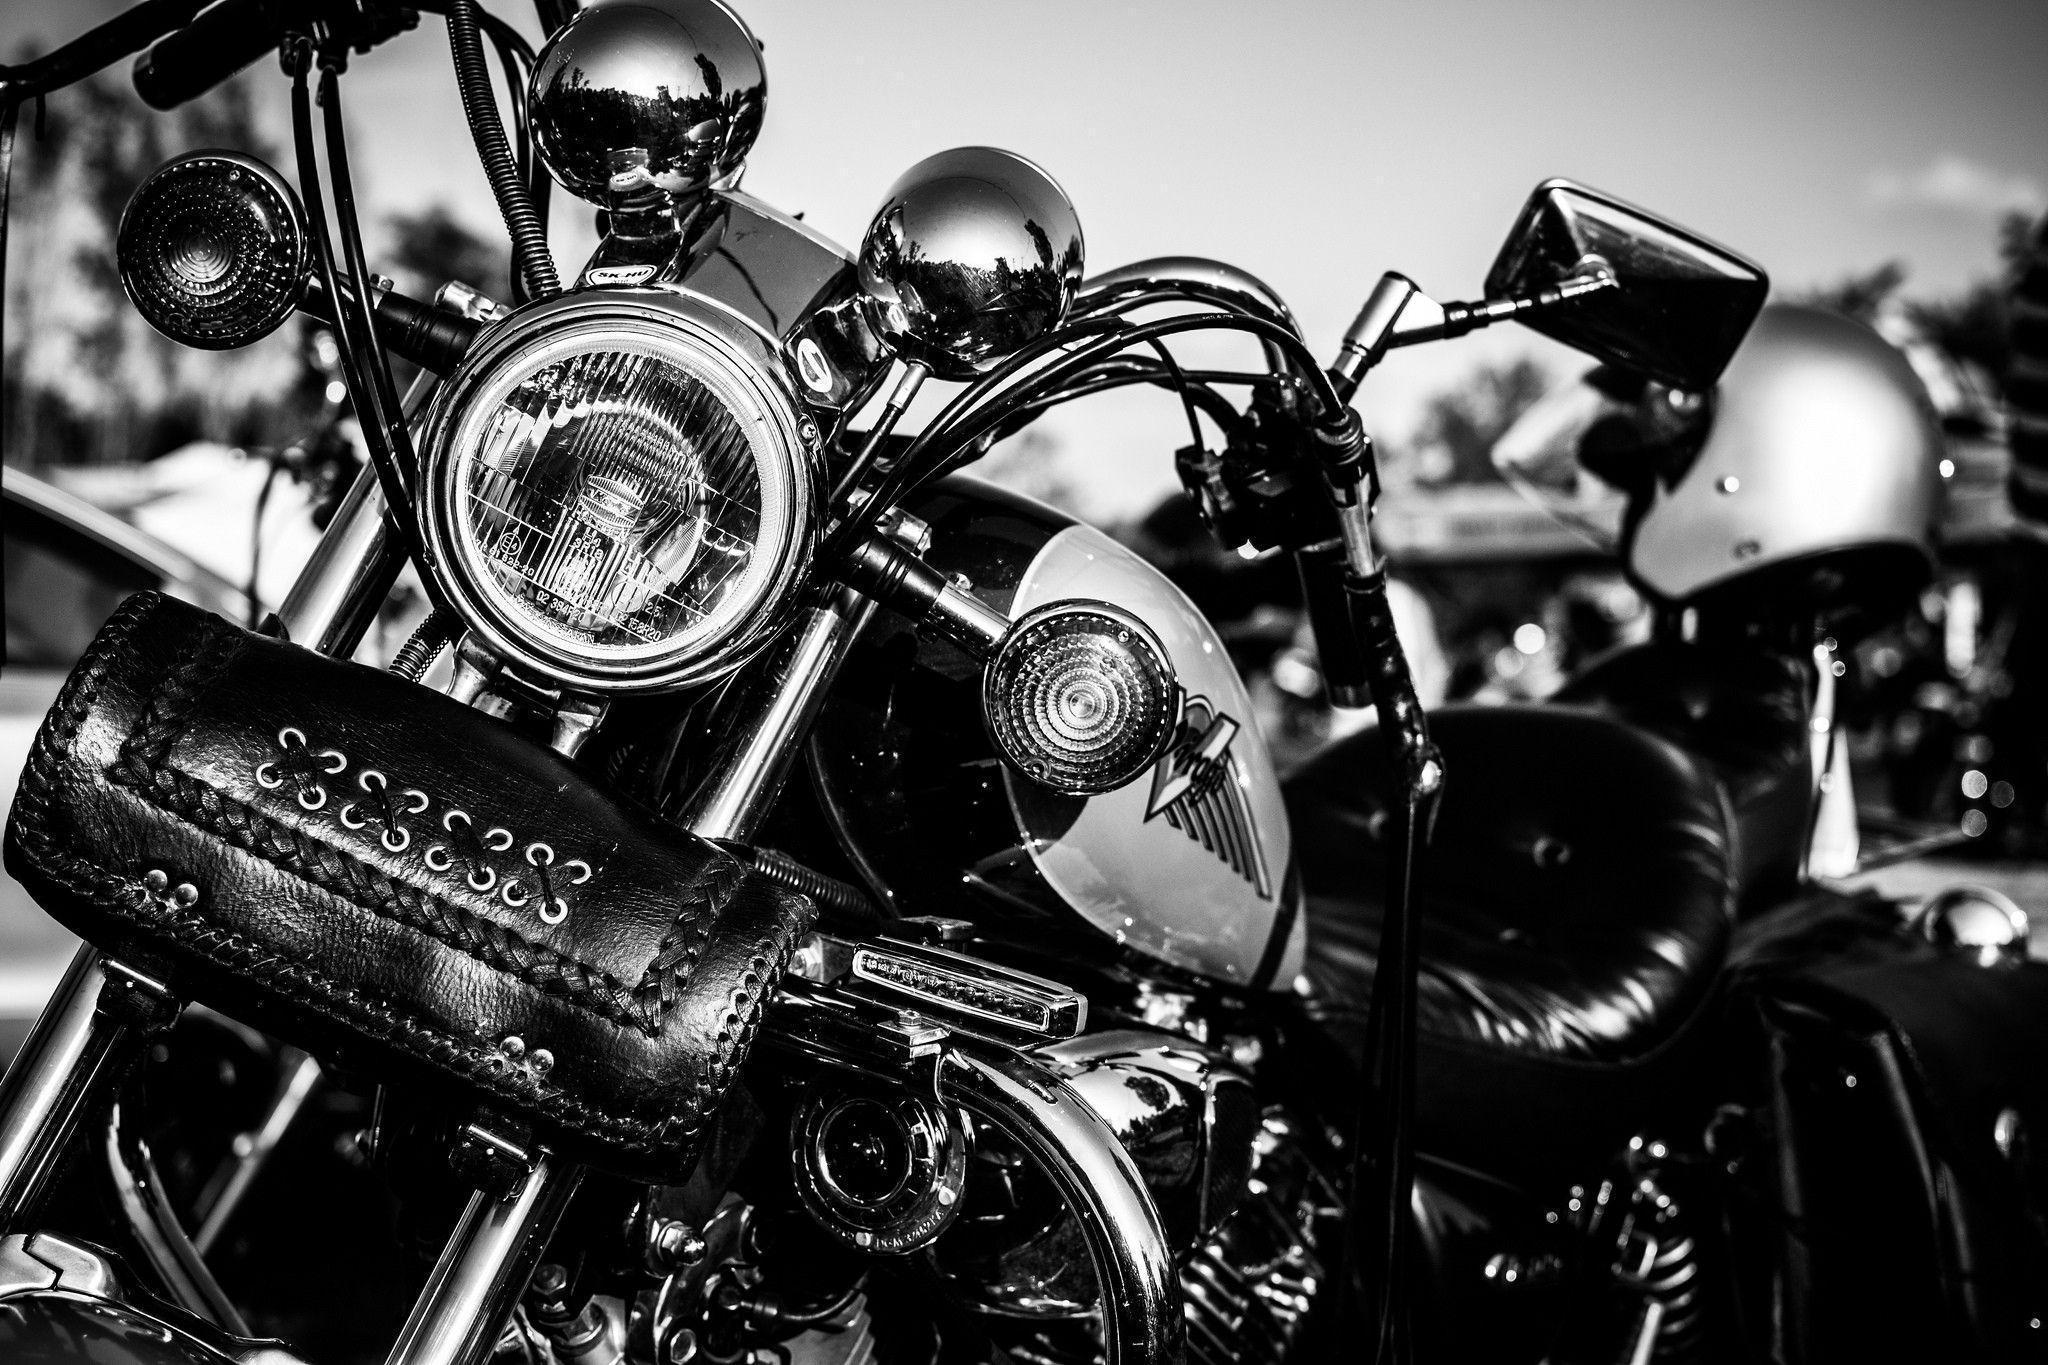 Harley Davidson HD Wallpapers 2048x1365